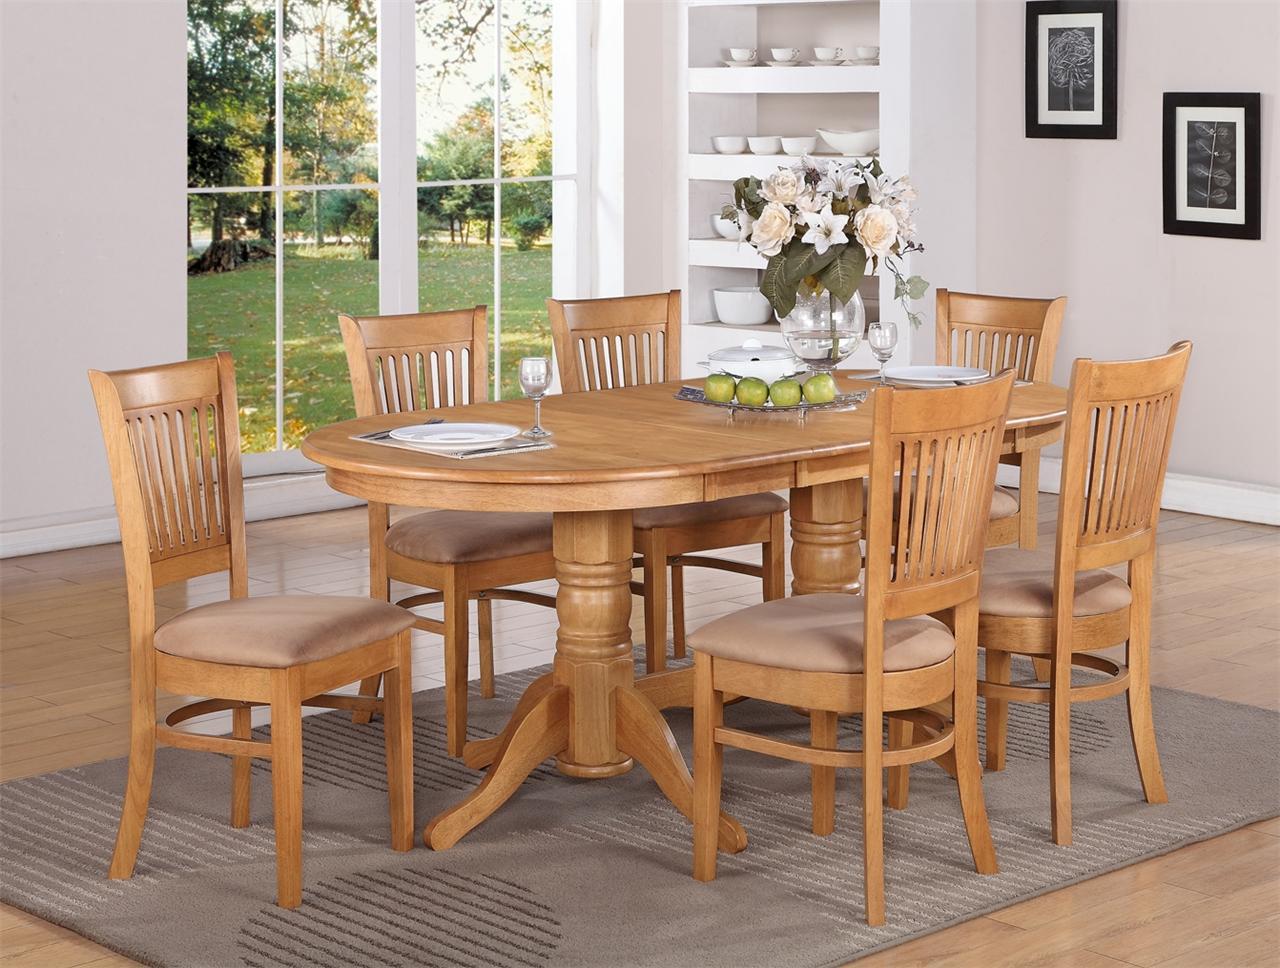 oak table and chairs oak kitchen table set best ideas 2017 SDSTSGT